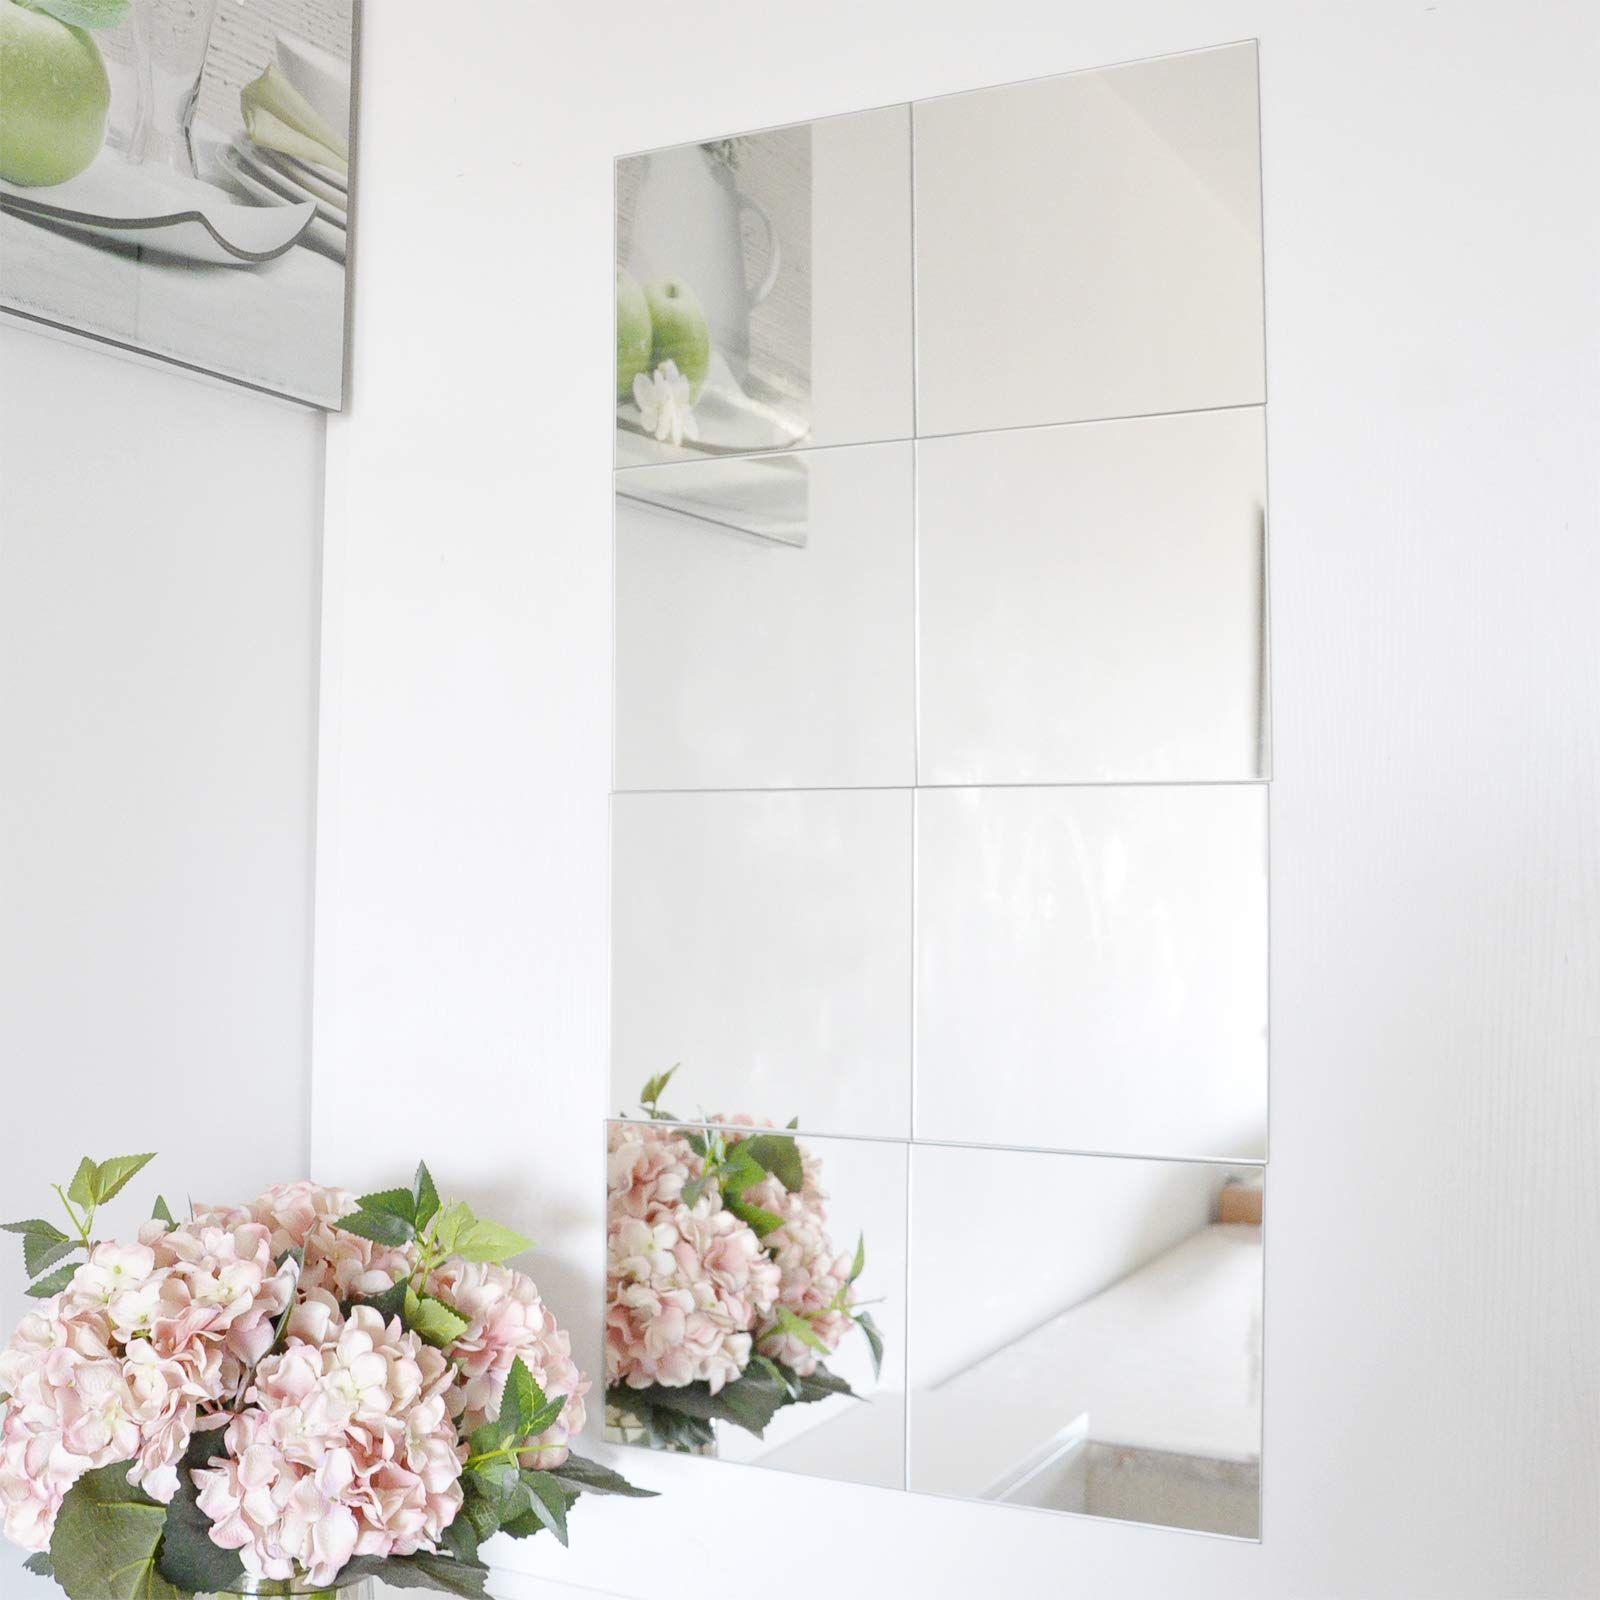 Muzilife Frameless Wall Mirror Set Dressing Mirror Tiles Self Adhesive 8 Pieces Combination Wall Mounted For Home In 2020 Wall Mirrors Set Dressing Mirror Mirror Wall